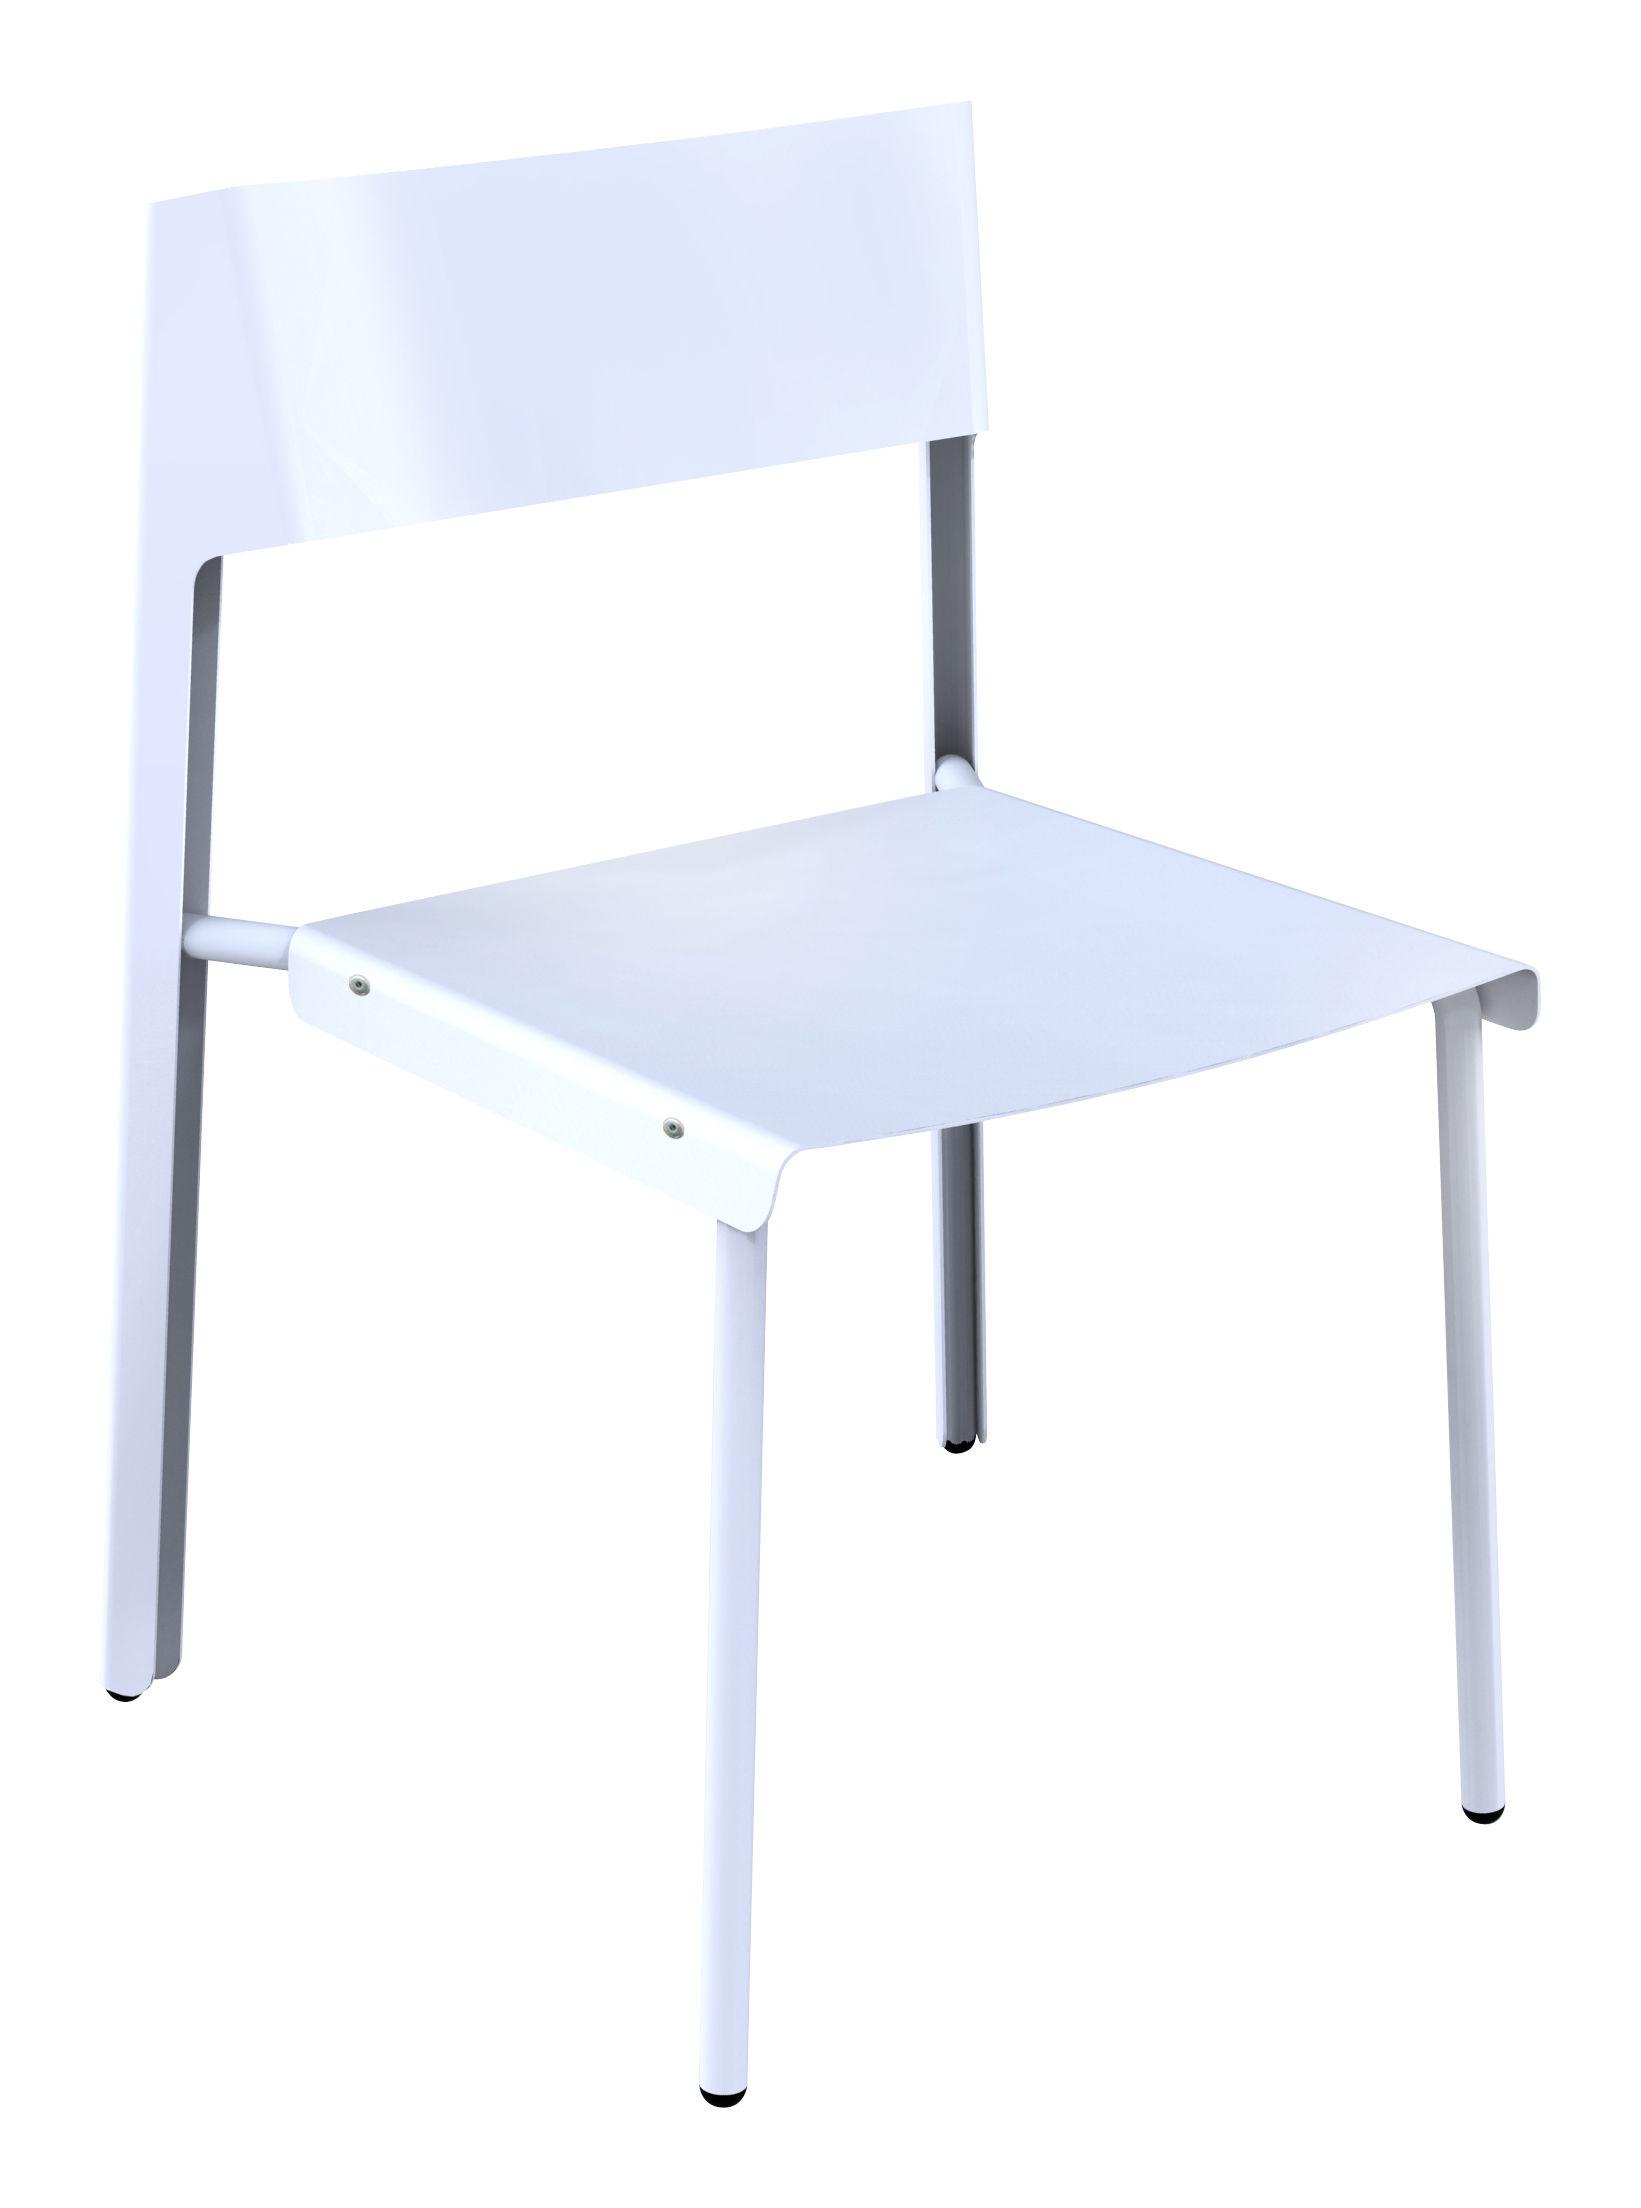 Mobilier - Chaises, fauteuils de salle à manger - Chaise Dakar - Skitsch - Blanc - Acier, Aluminium